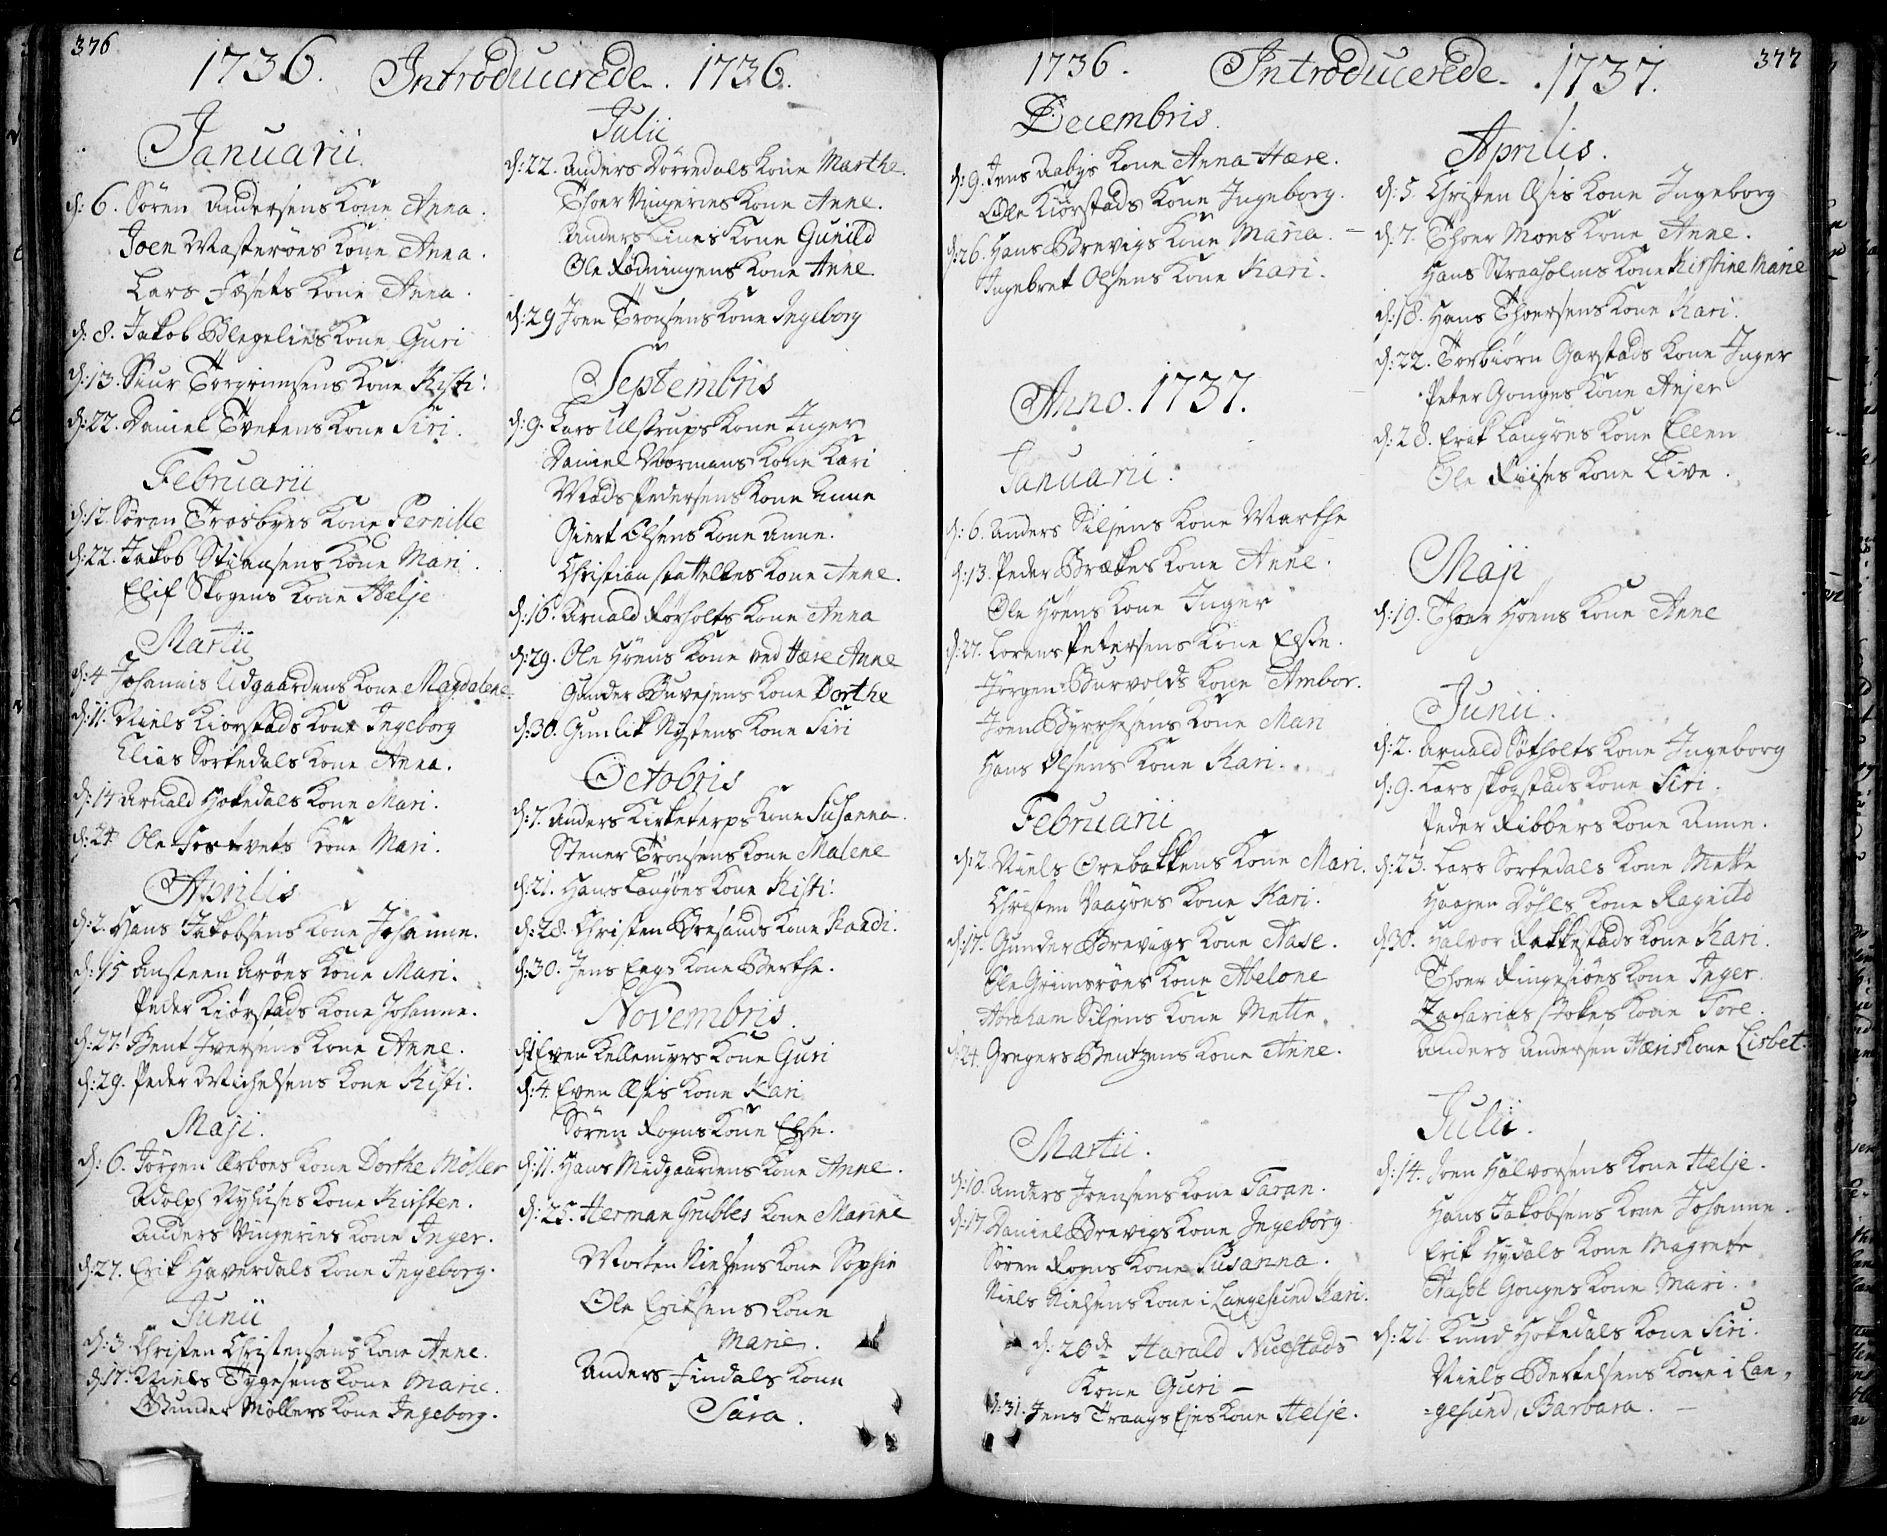 SAKO, Bamble kirkebøker, F/Fa/L0001: Ministerialbok nr. I 1, 1702-1774, s. 376-377